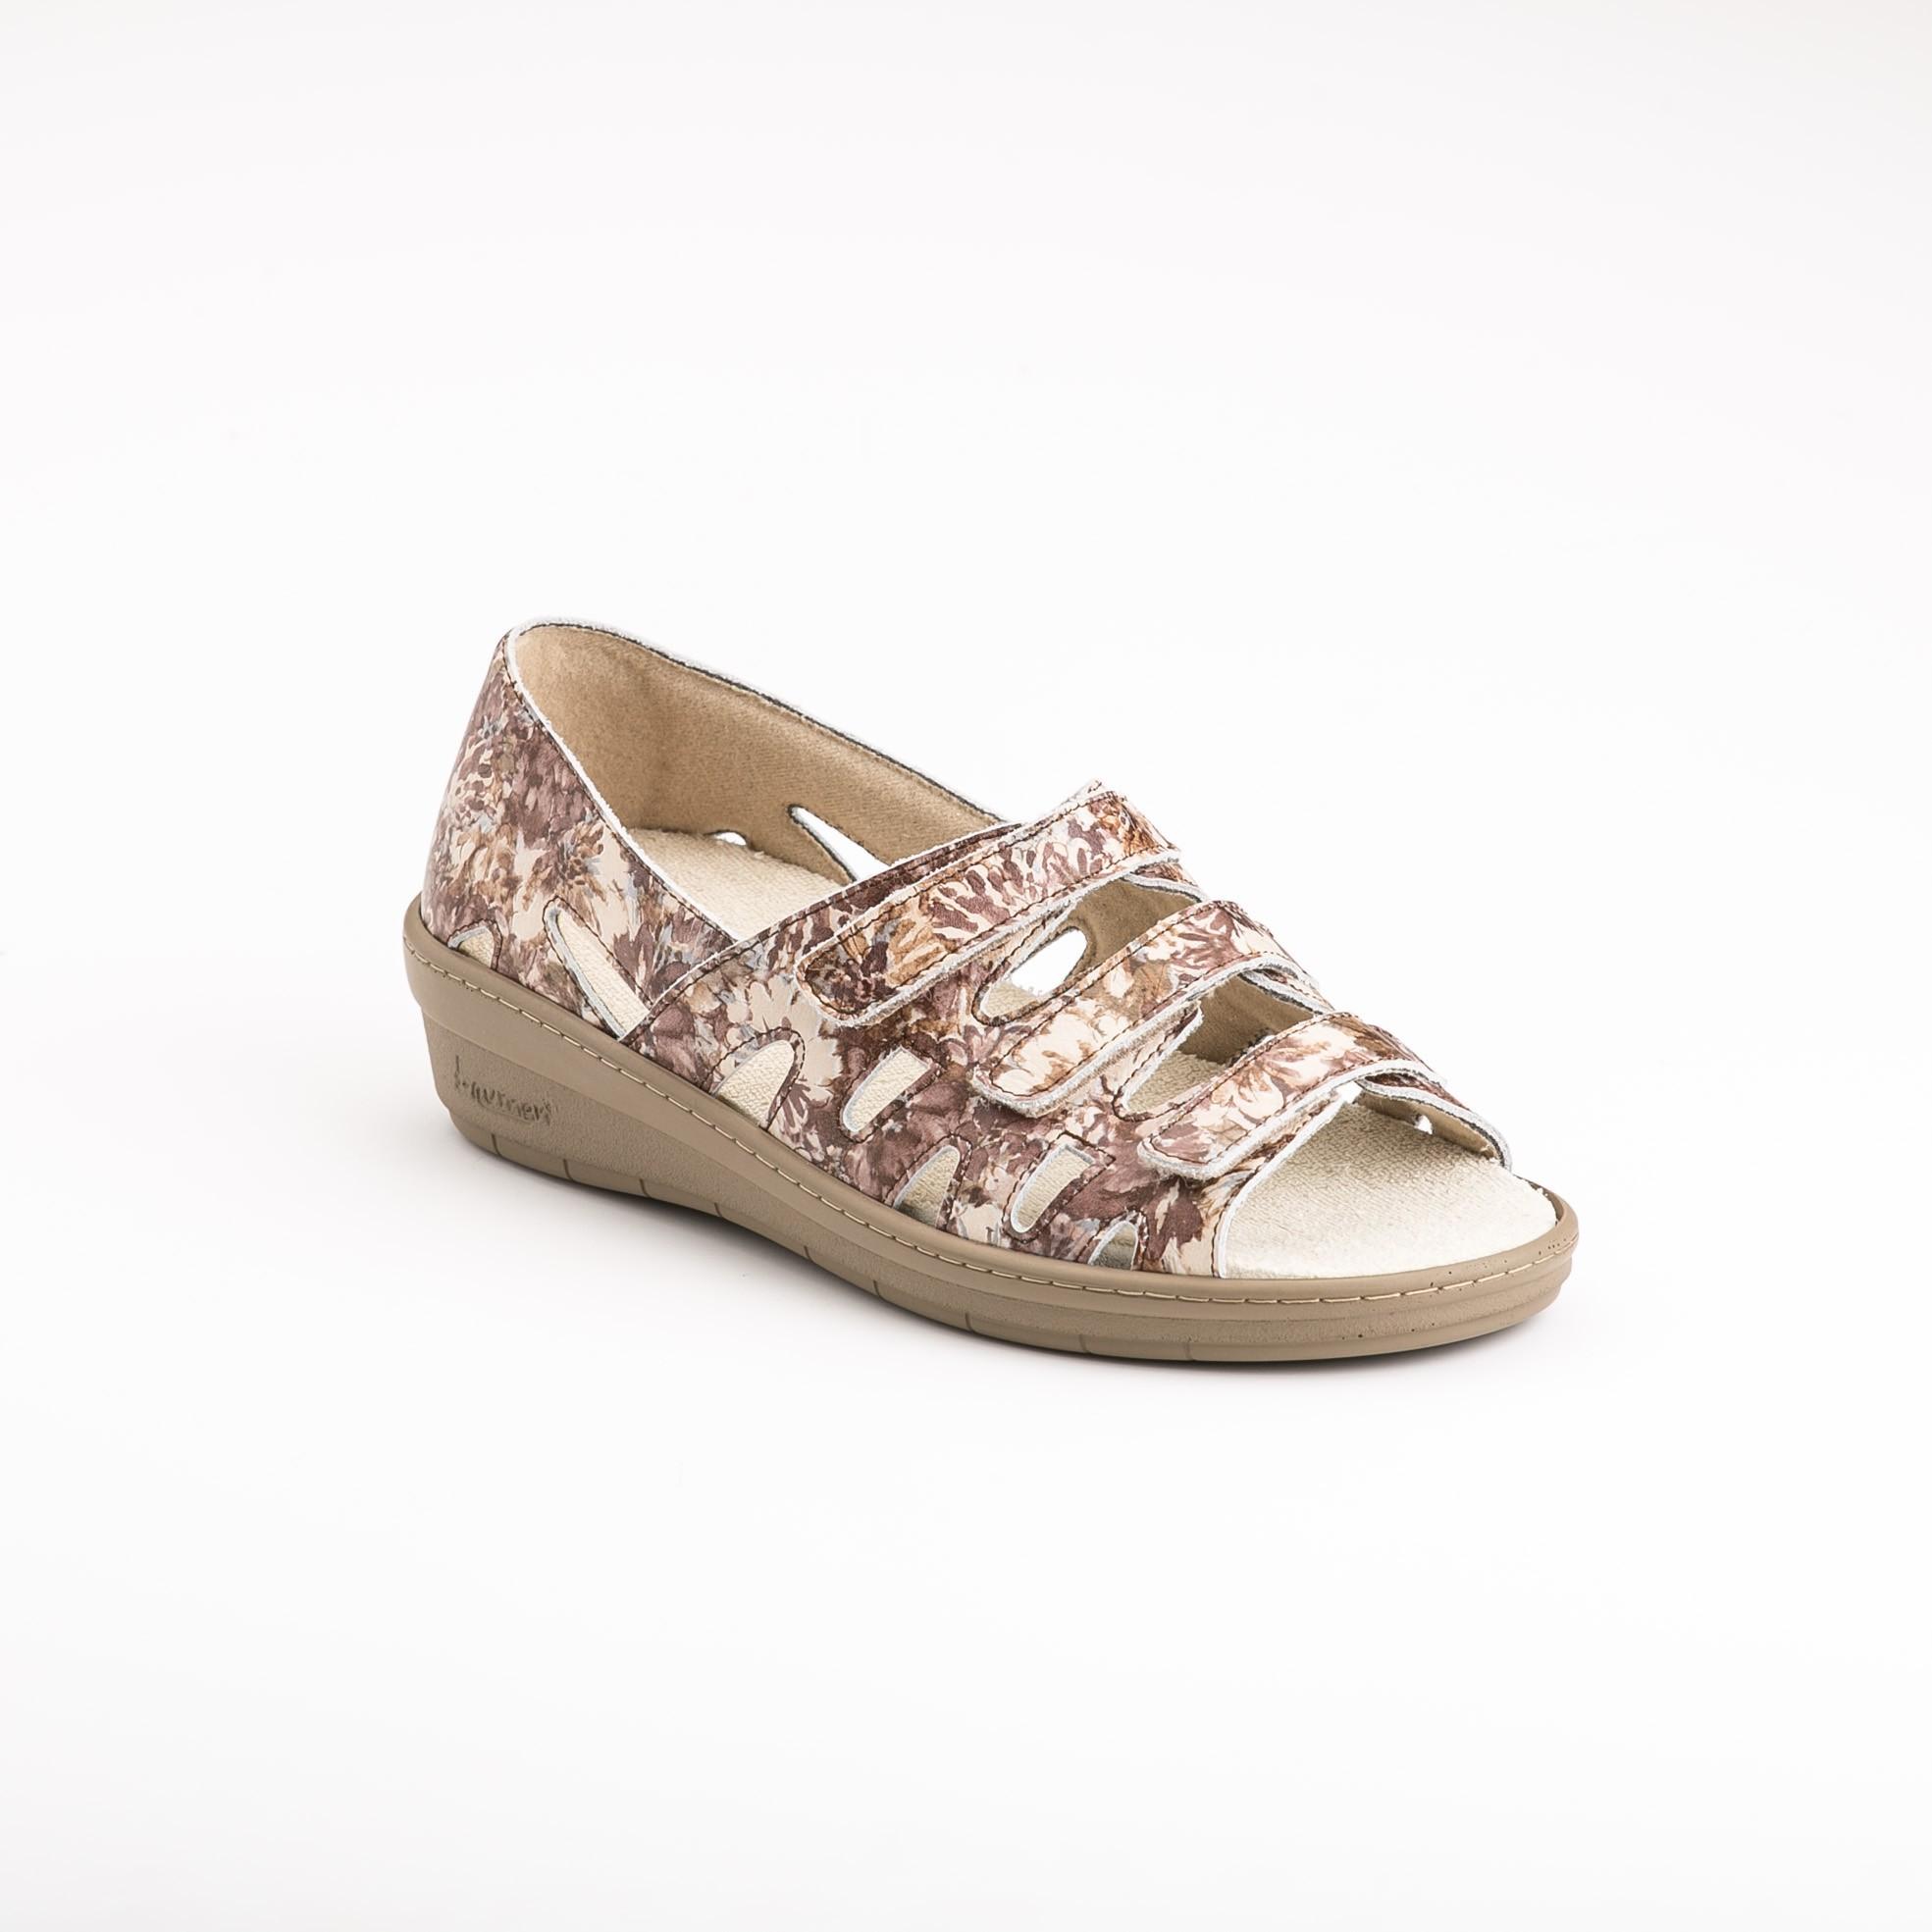 Br Chaussure Chaussure Chut Chut 3059 XnS6qx